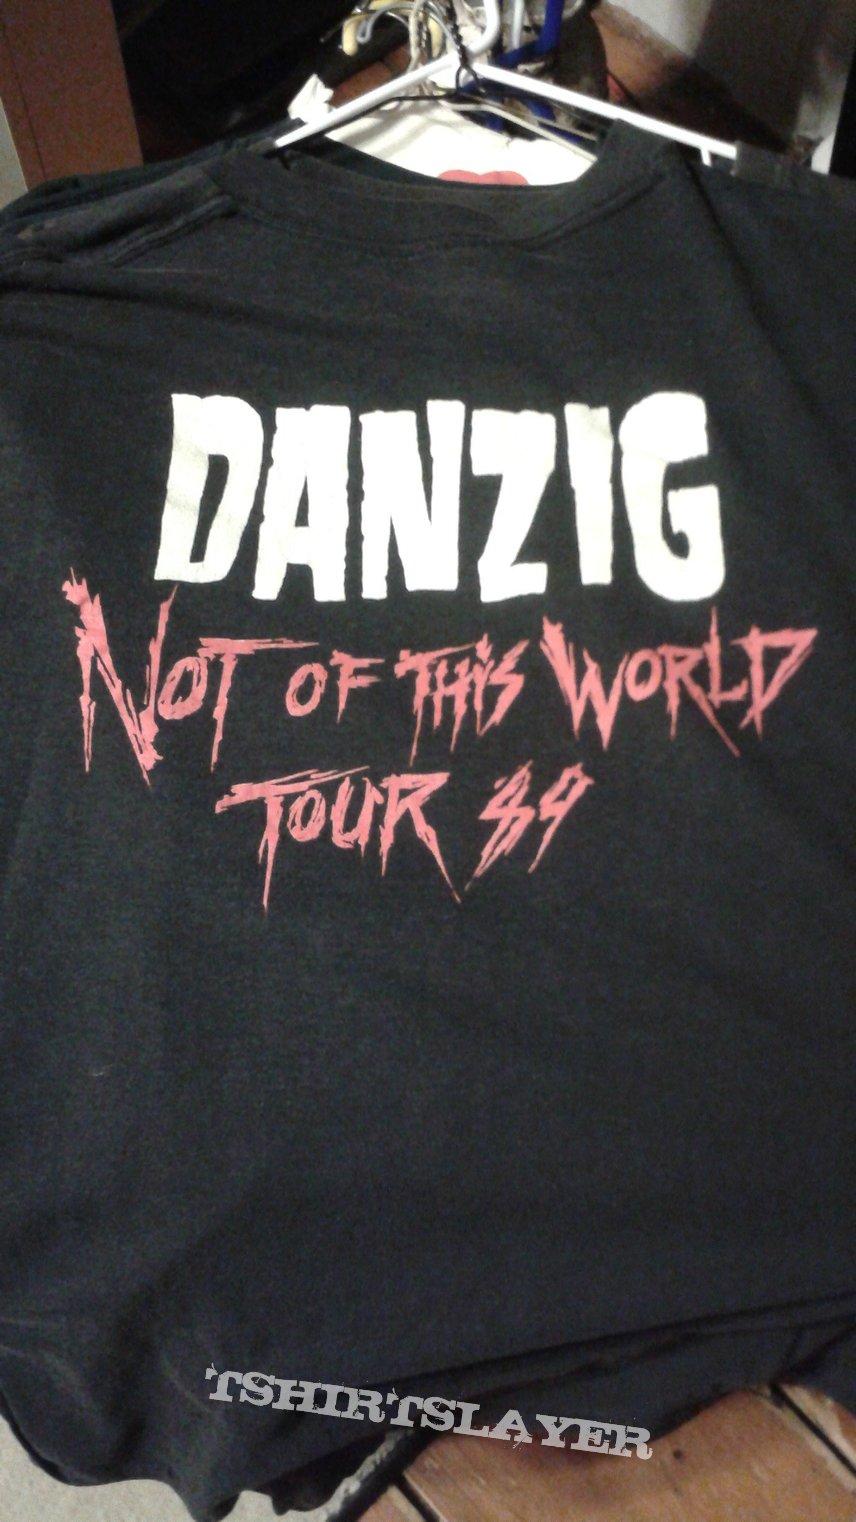 Danzig Not Of This World 1989 tour t-shirt.